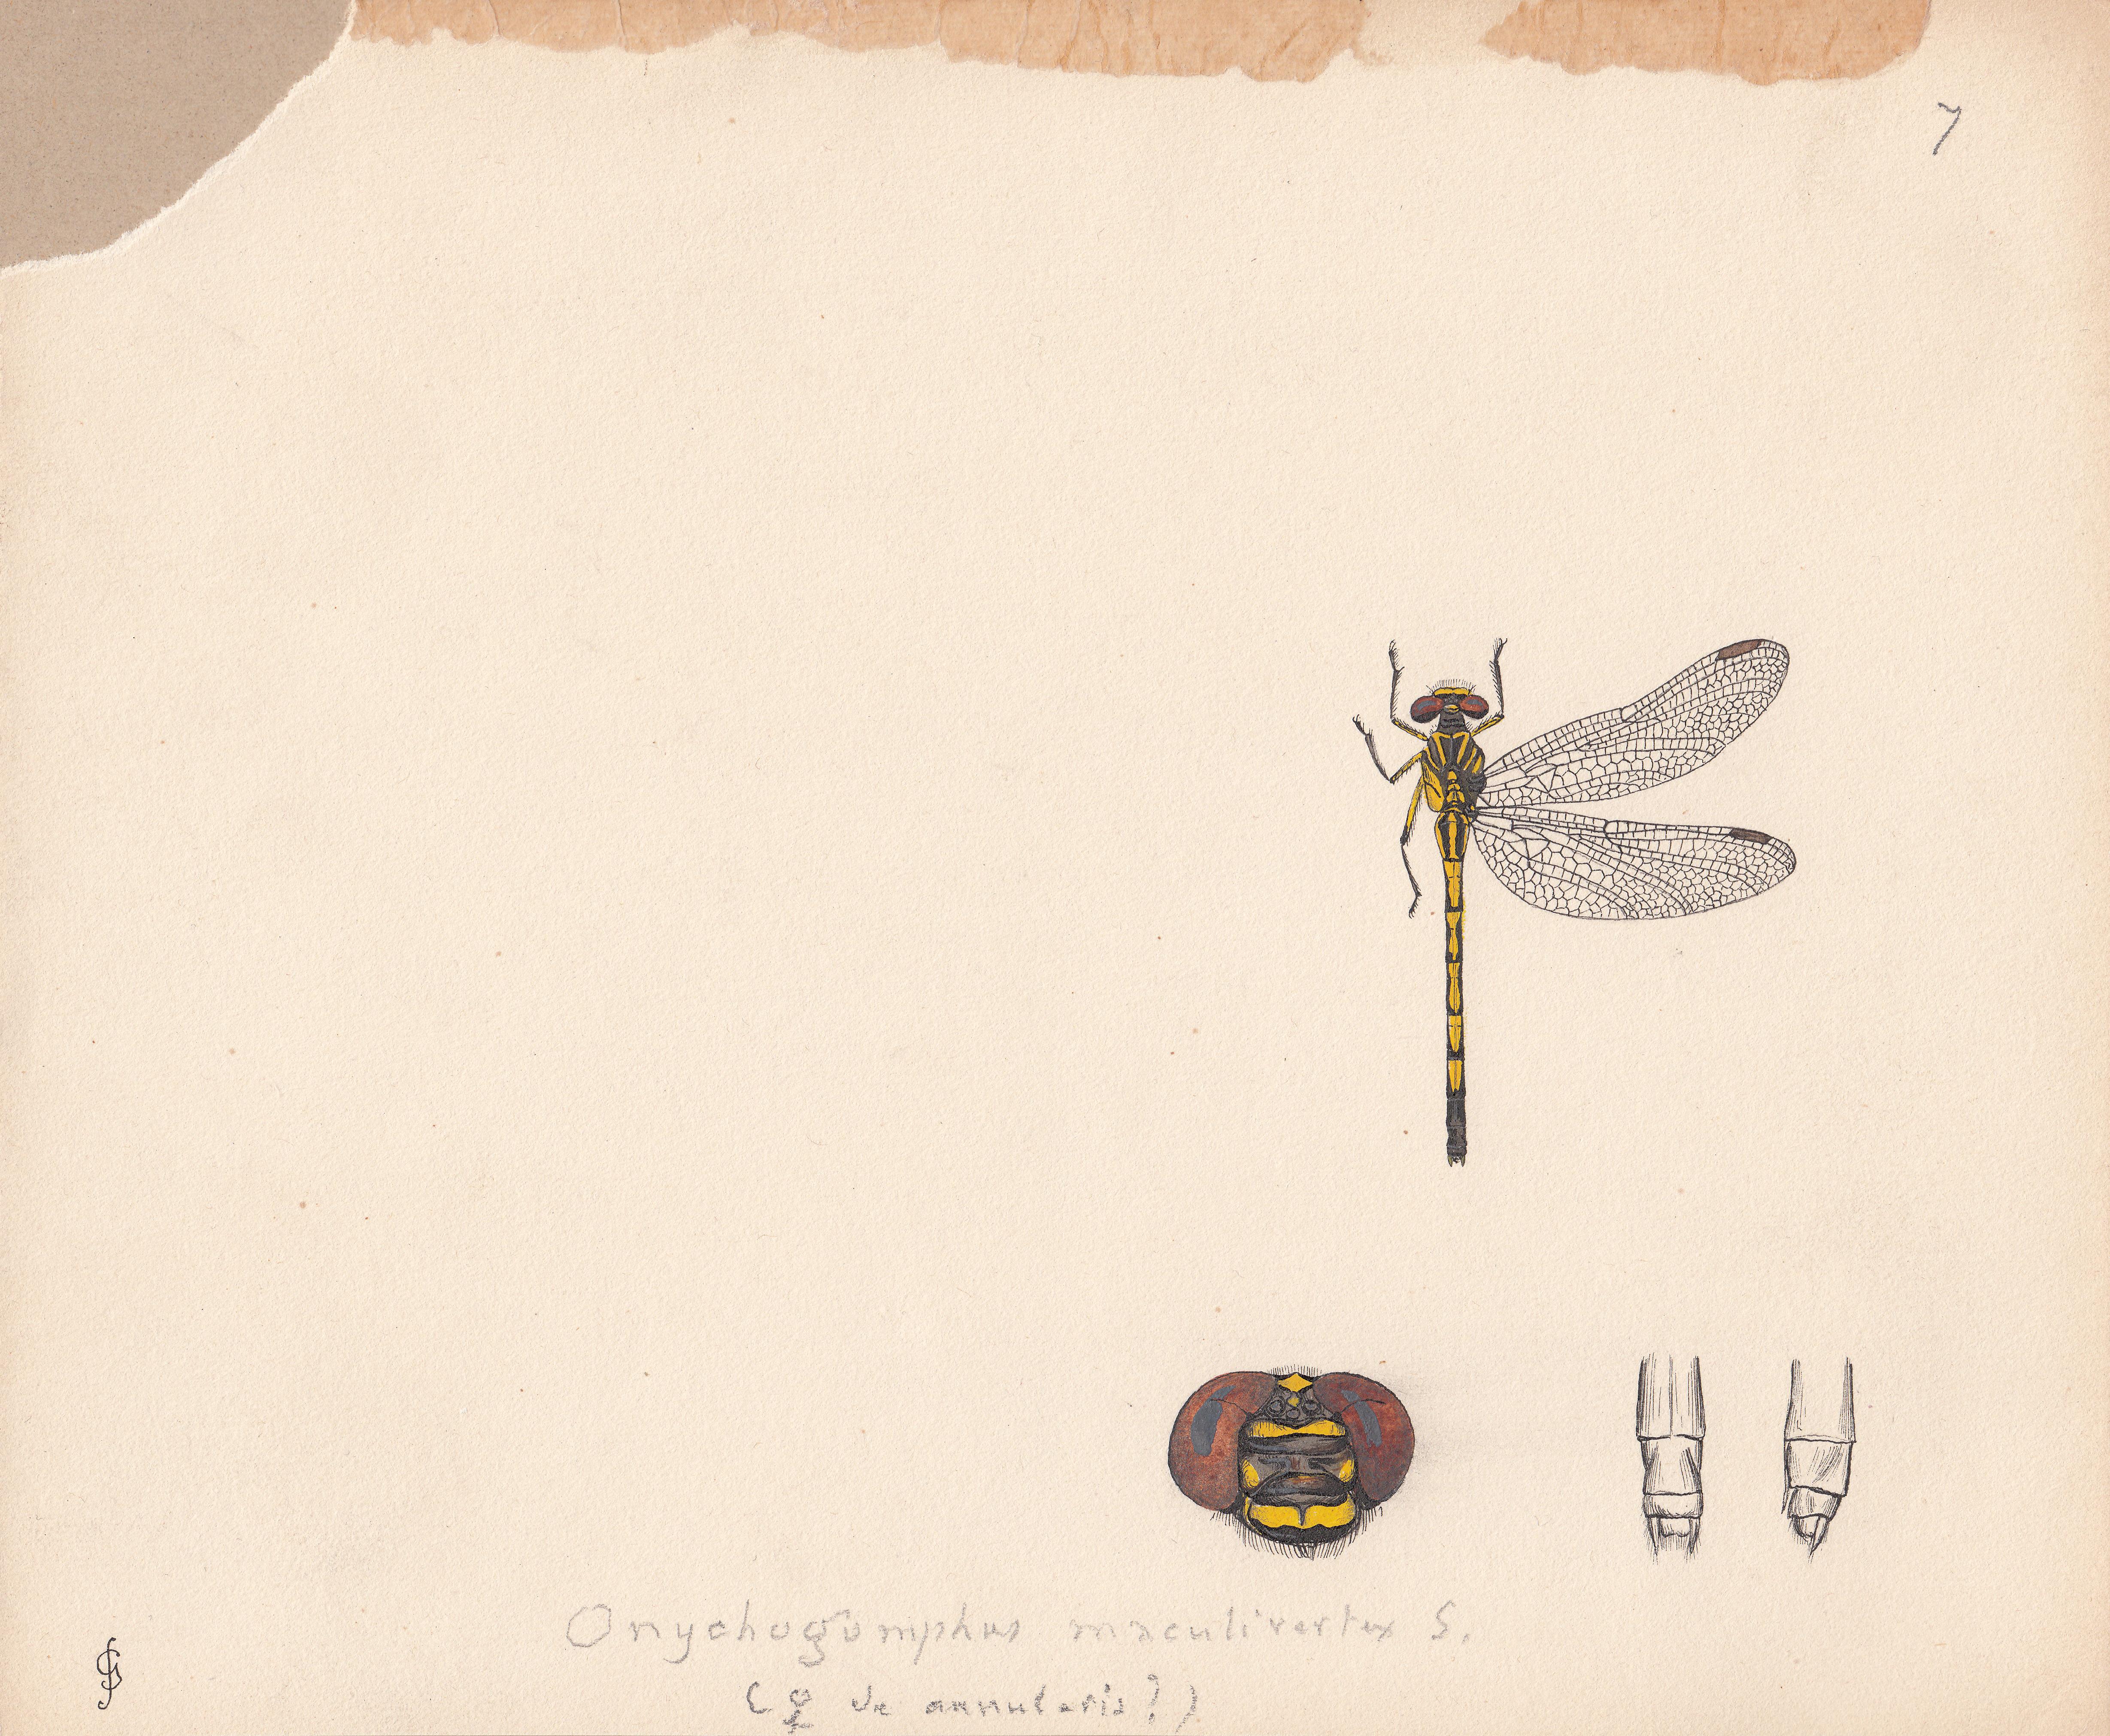 Onychogomphus maculivertex.jpg